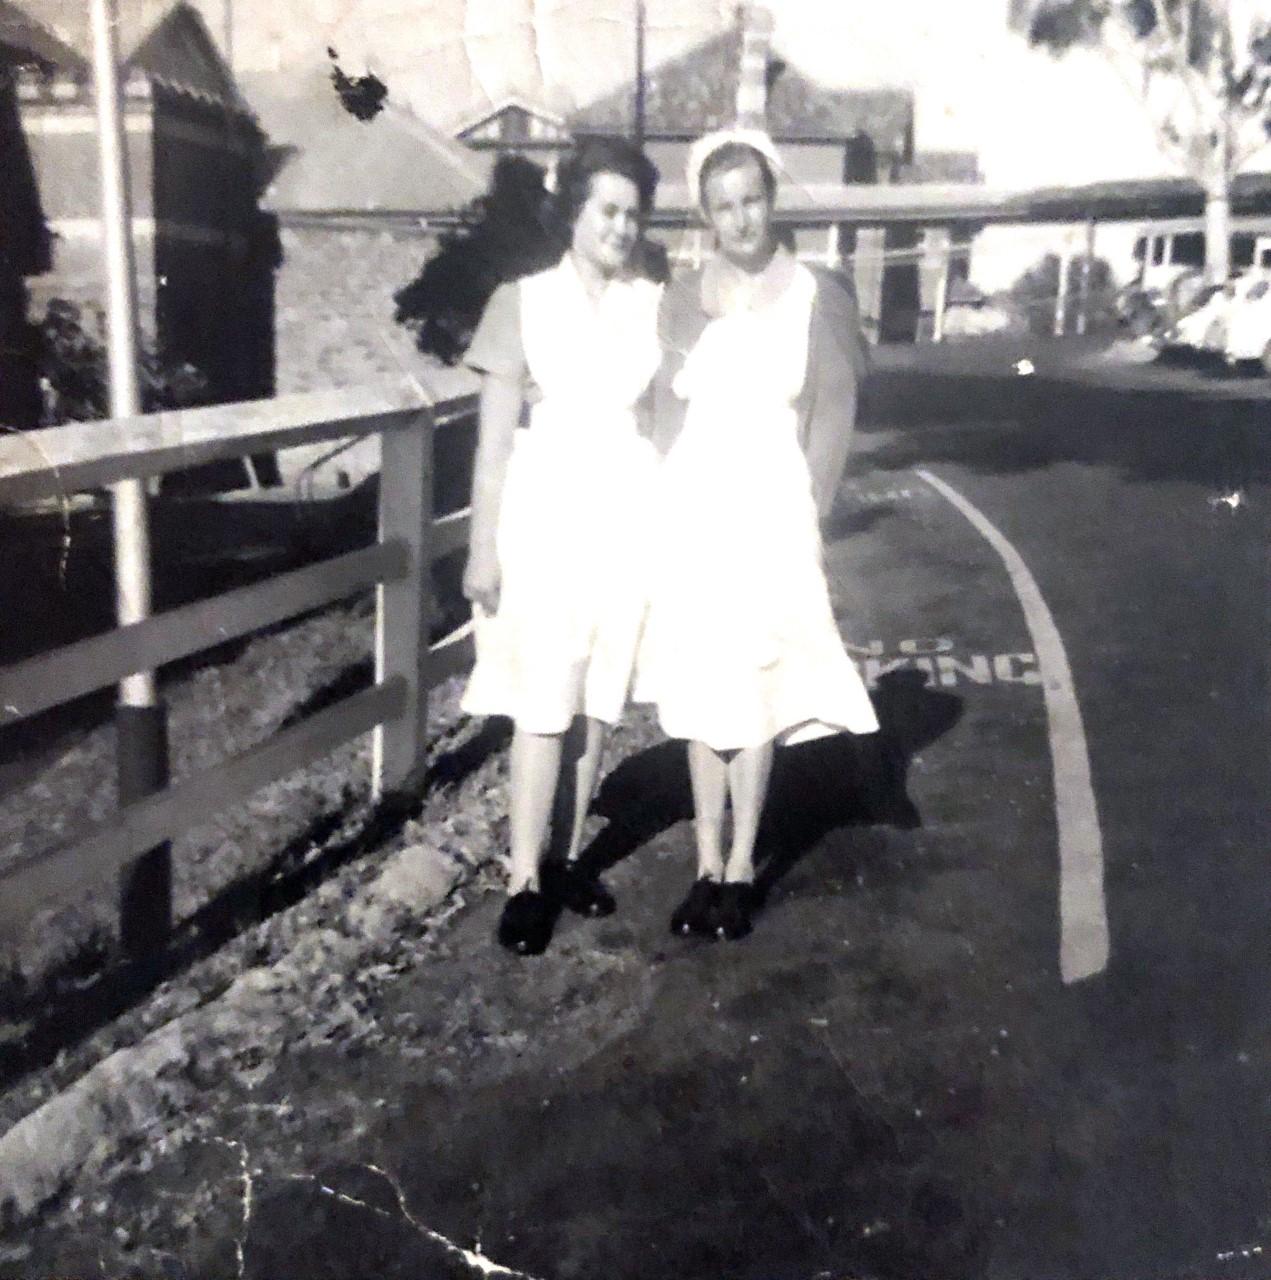 Glenda  and  a friend, Claremont hospital c. 1960s